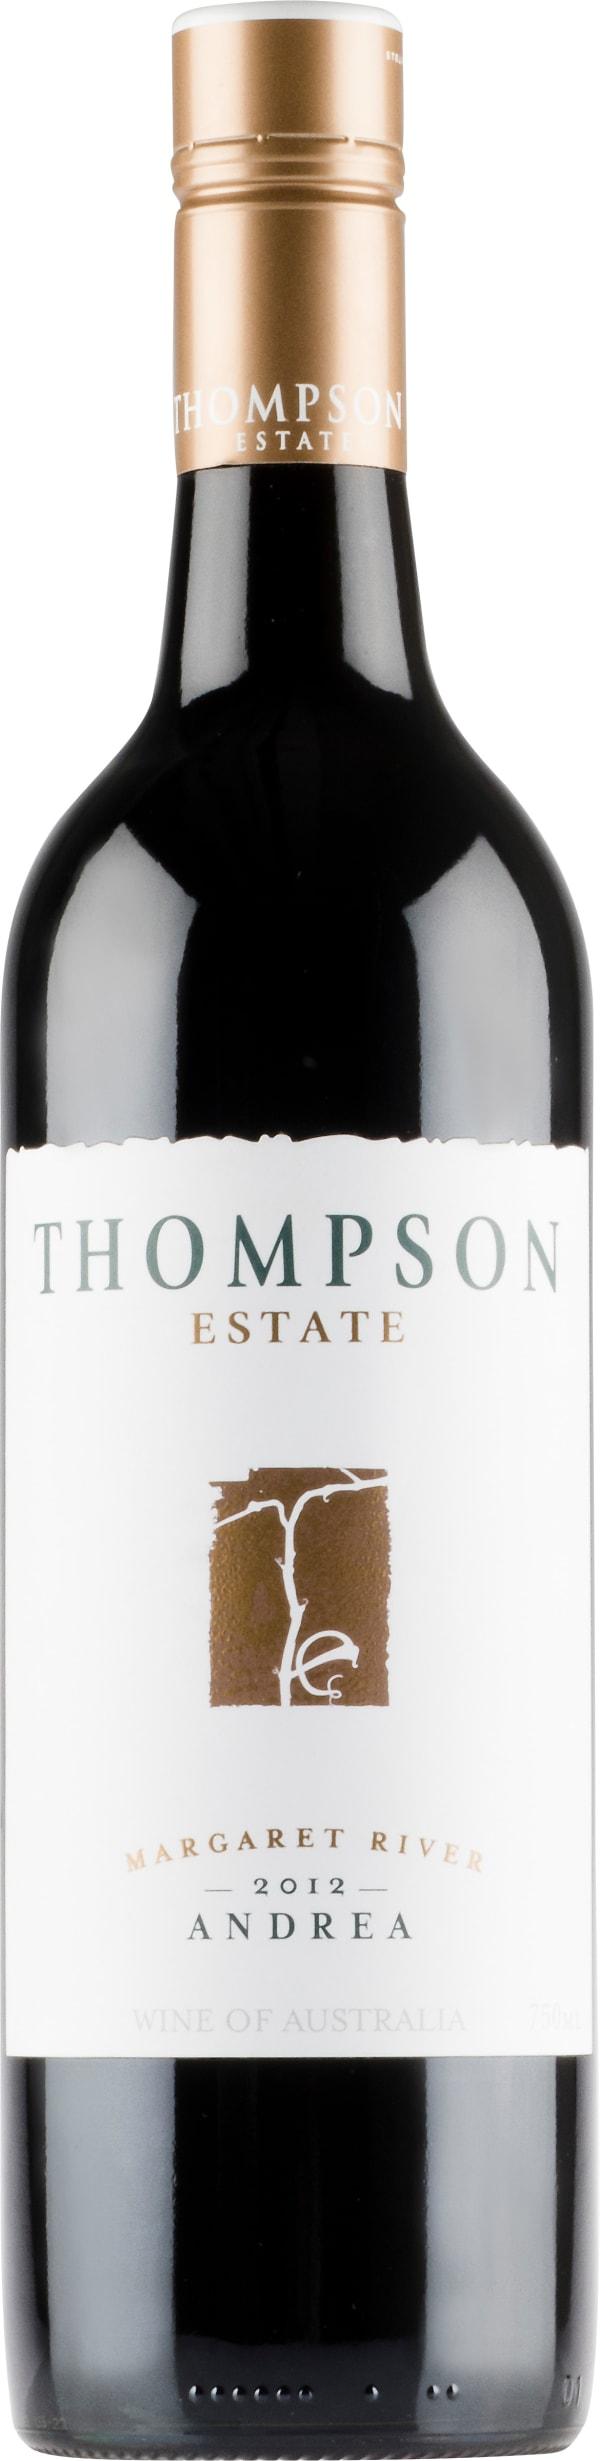 Thompson Estate Andrea Cabernet Merlot 2012